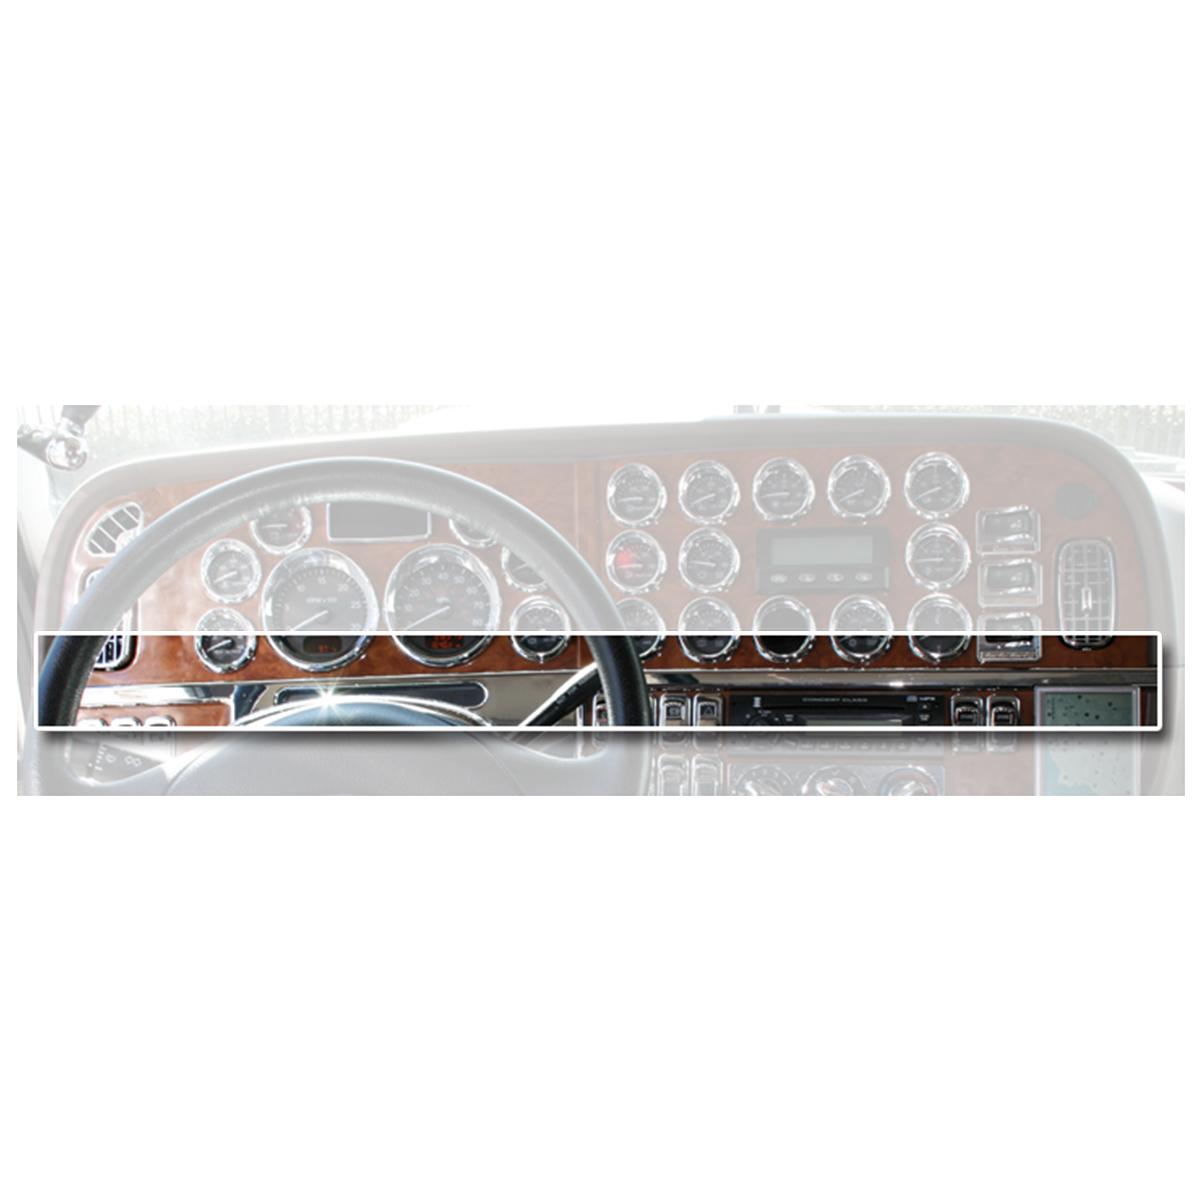 67955 Dash Panel Molding Trim for Peterbilt 2006 & Later